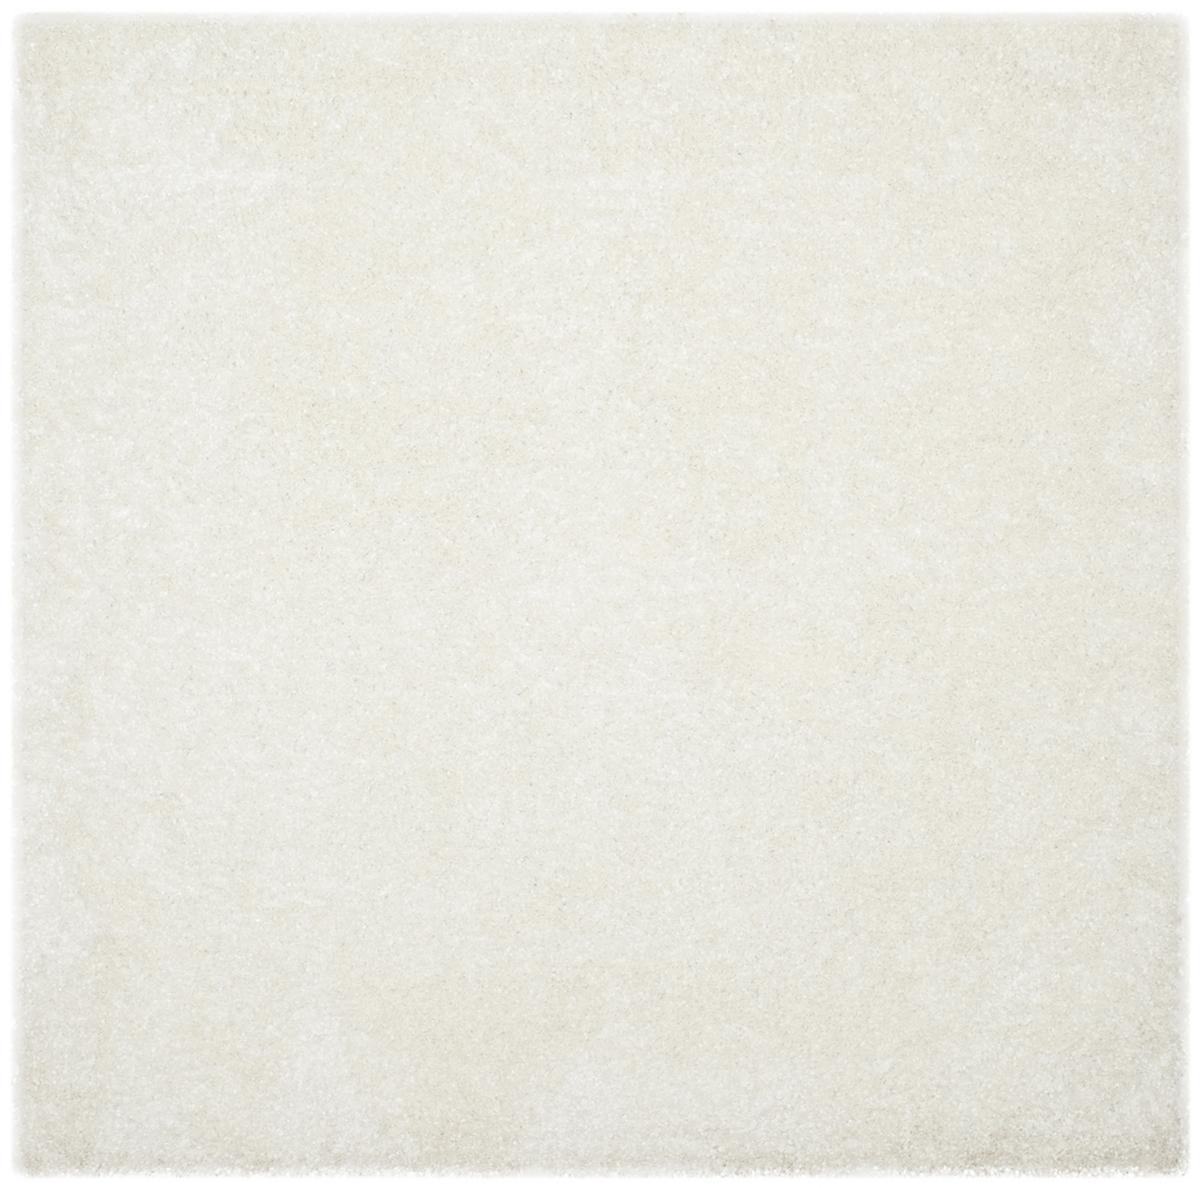 Soft White Shag Malibu Shag Collection